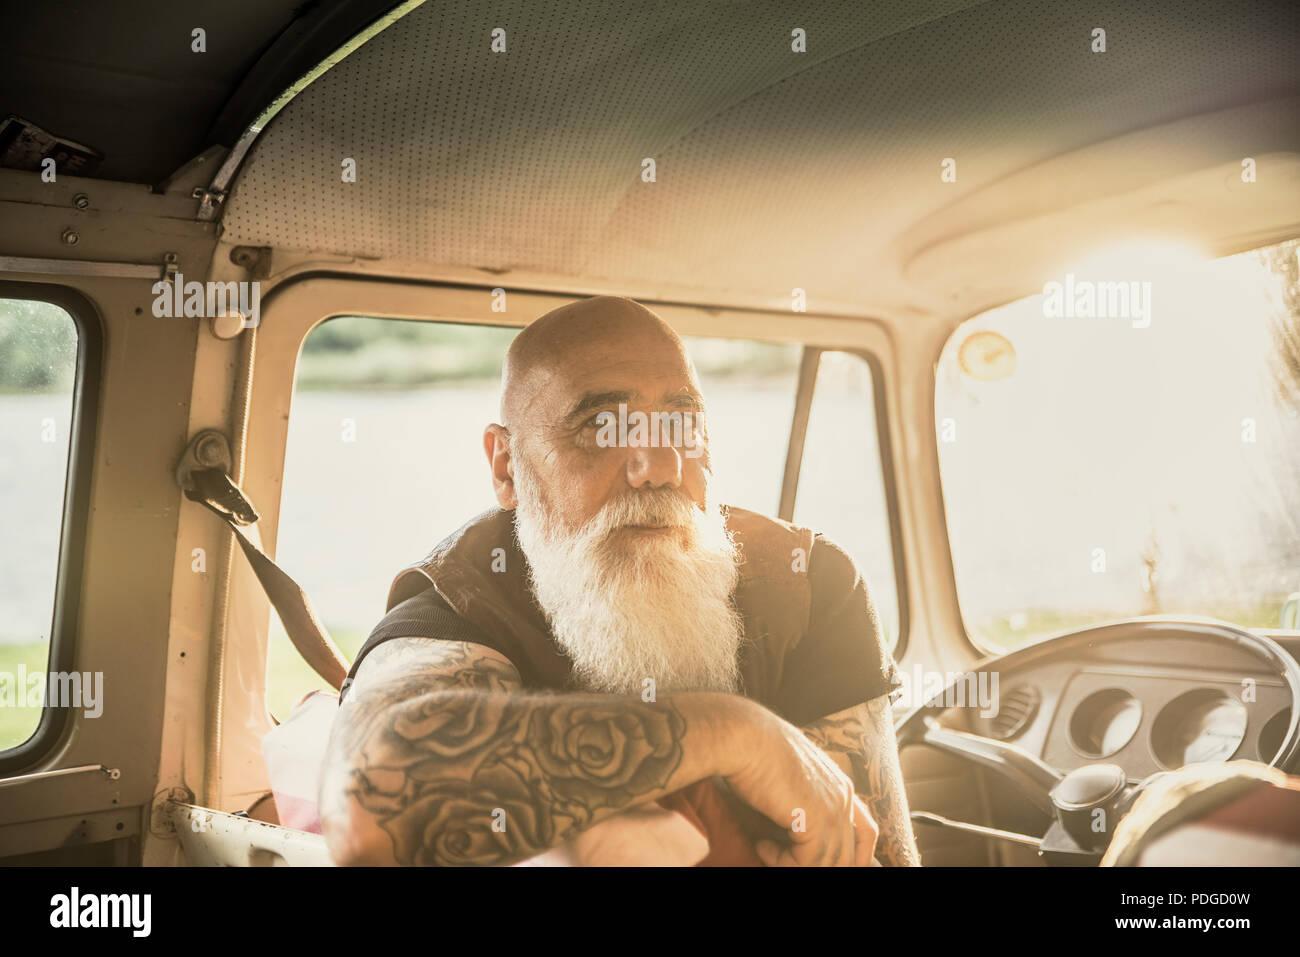 Portrait of a senior hipster inside their vintage van  - Stock Image